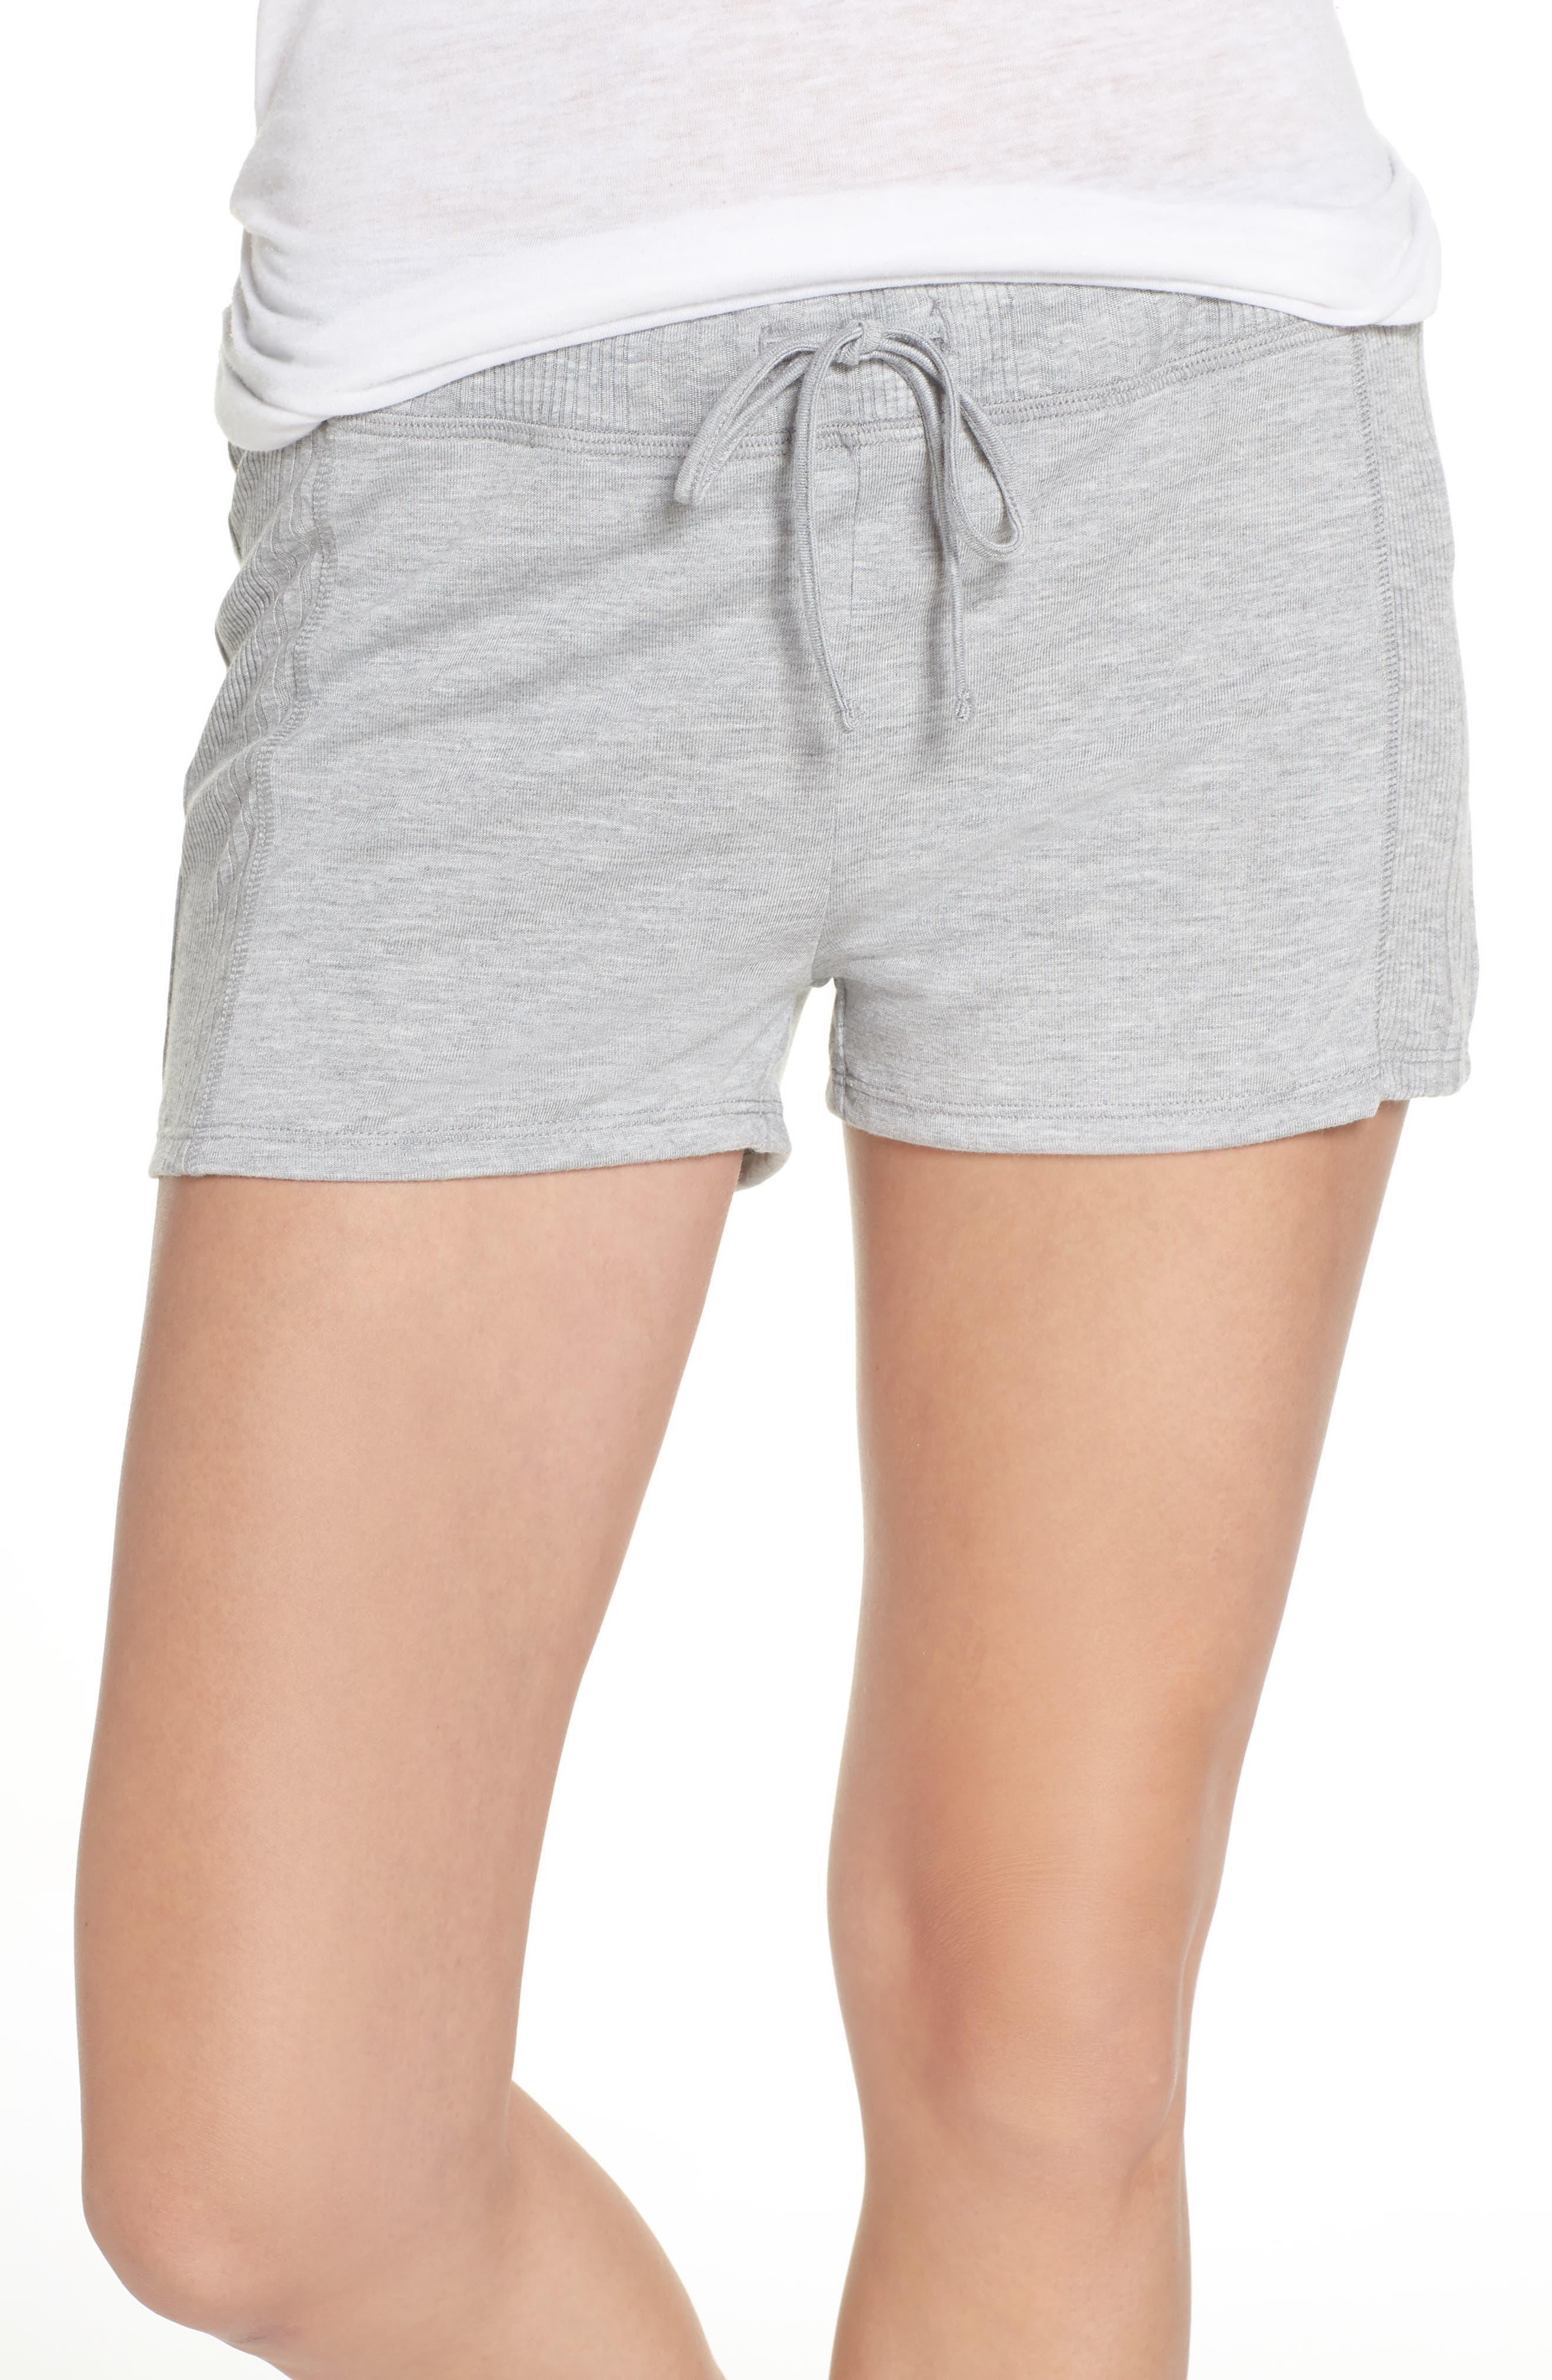 Pajama Shorts,                             Main thumbnail 1, color,                             LIGHT HEATHER GREY